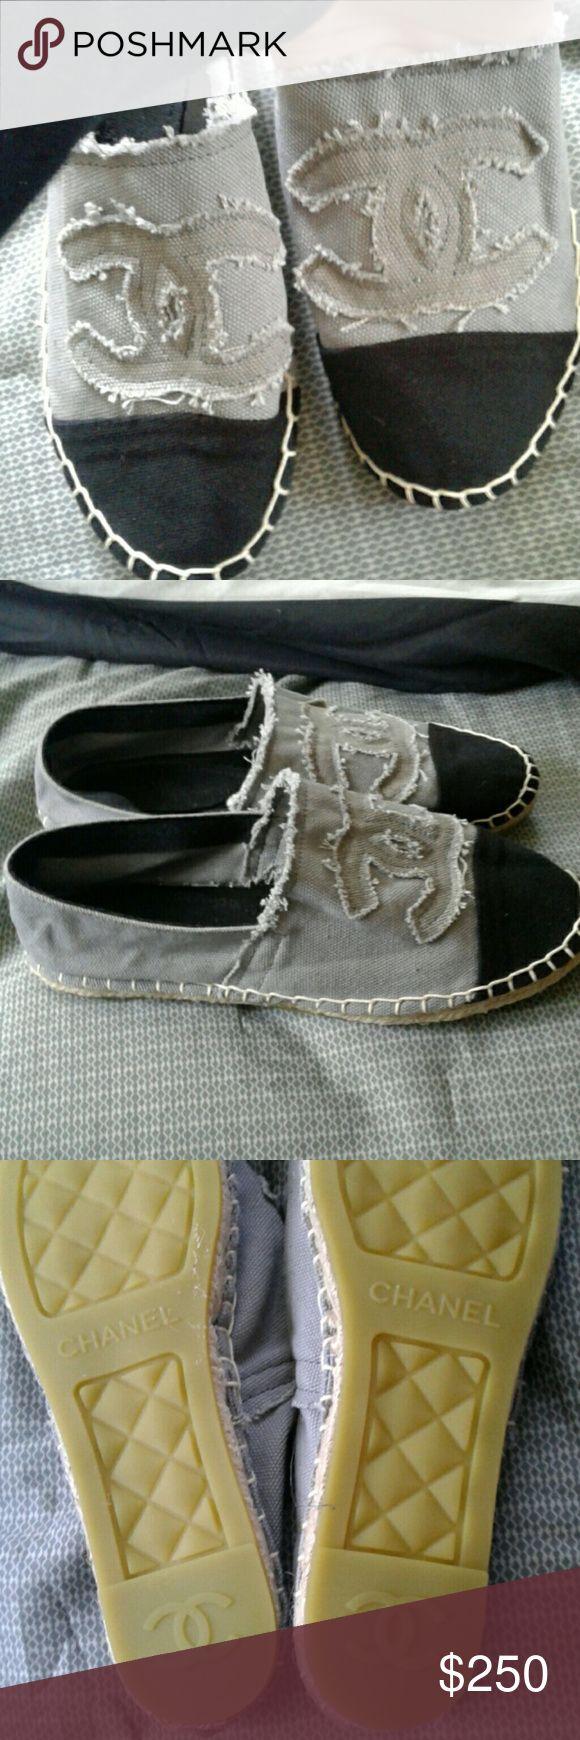 Selling this Chanel Espadrilles on Poshmark! My username is: brittnayy420. #shopmycloset #poshmark #fashion #shopping #style #forsale #CHANEL #Shoes